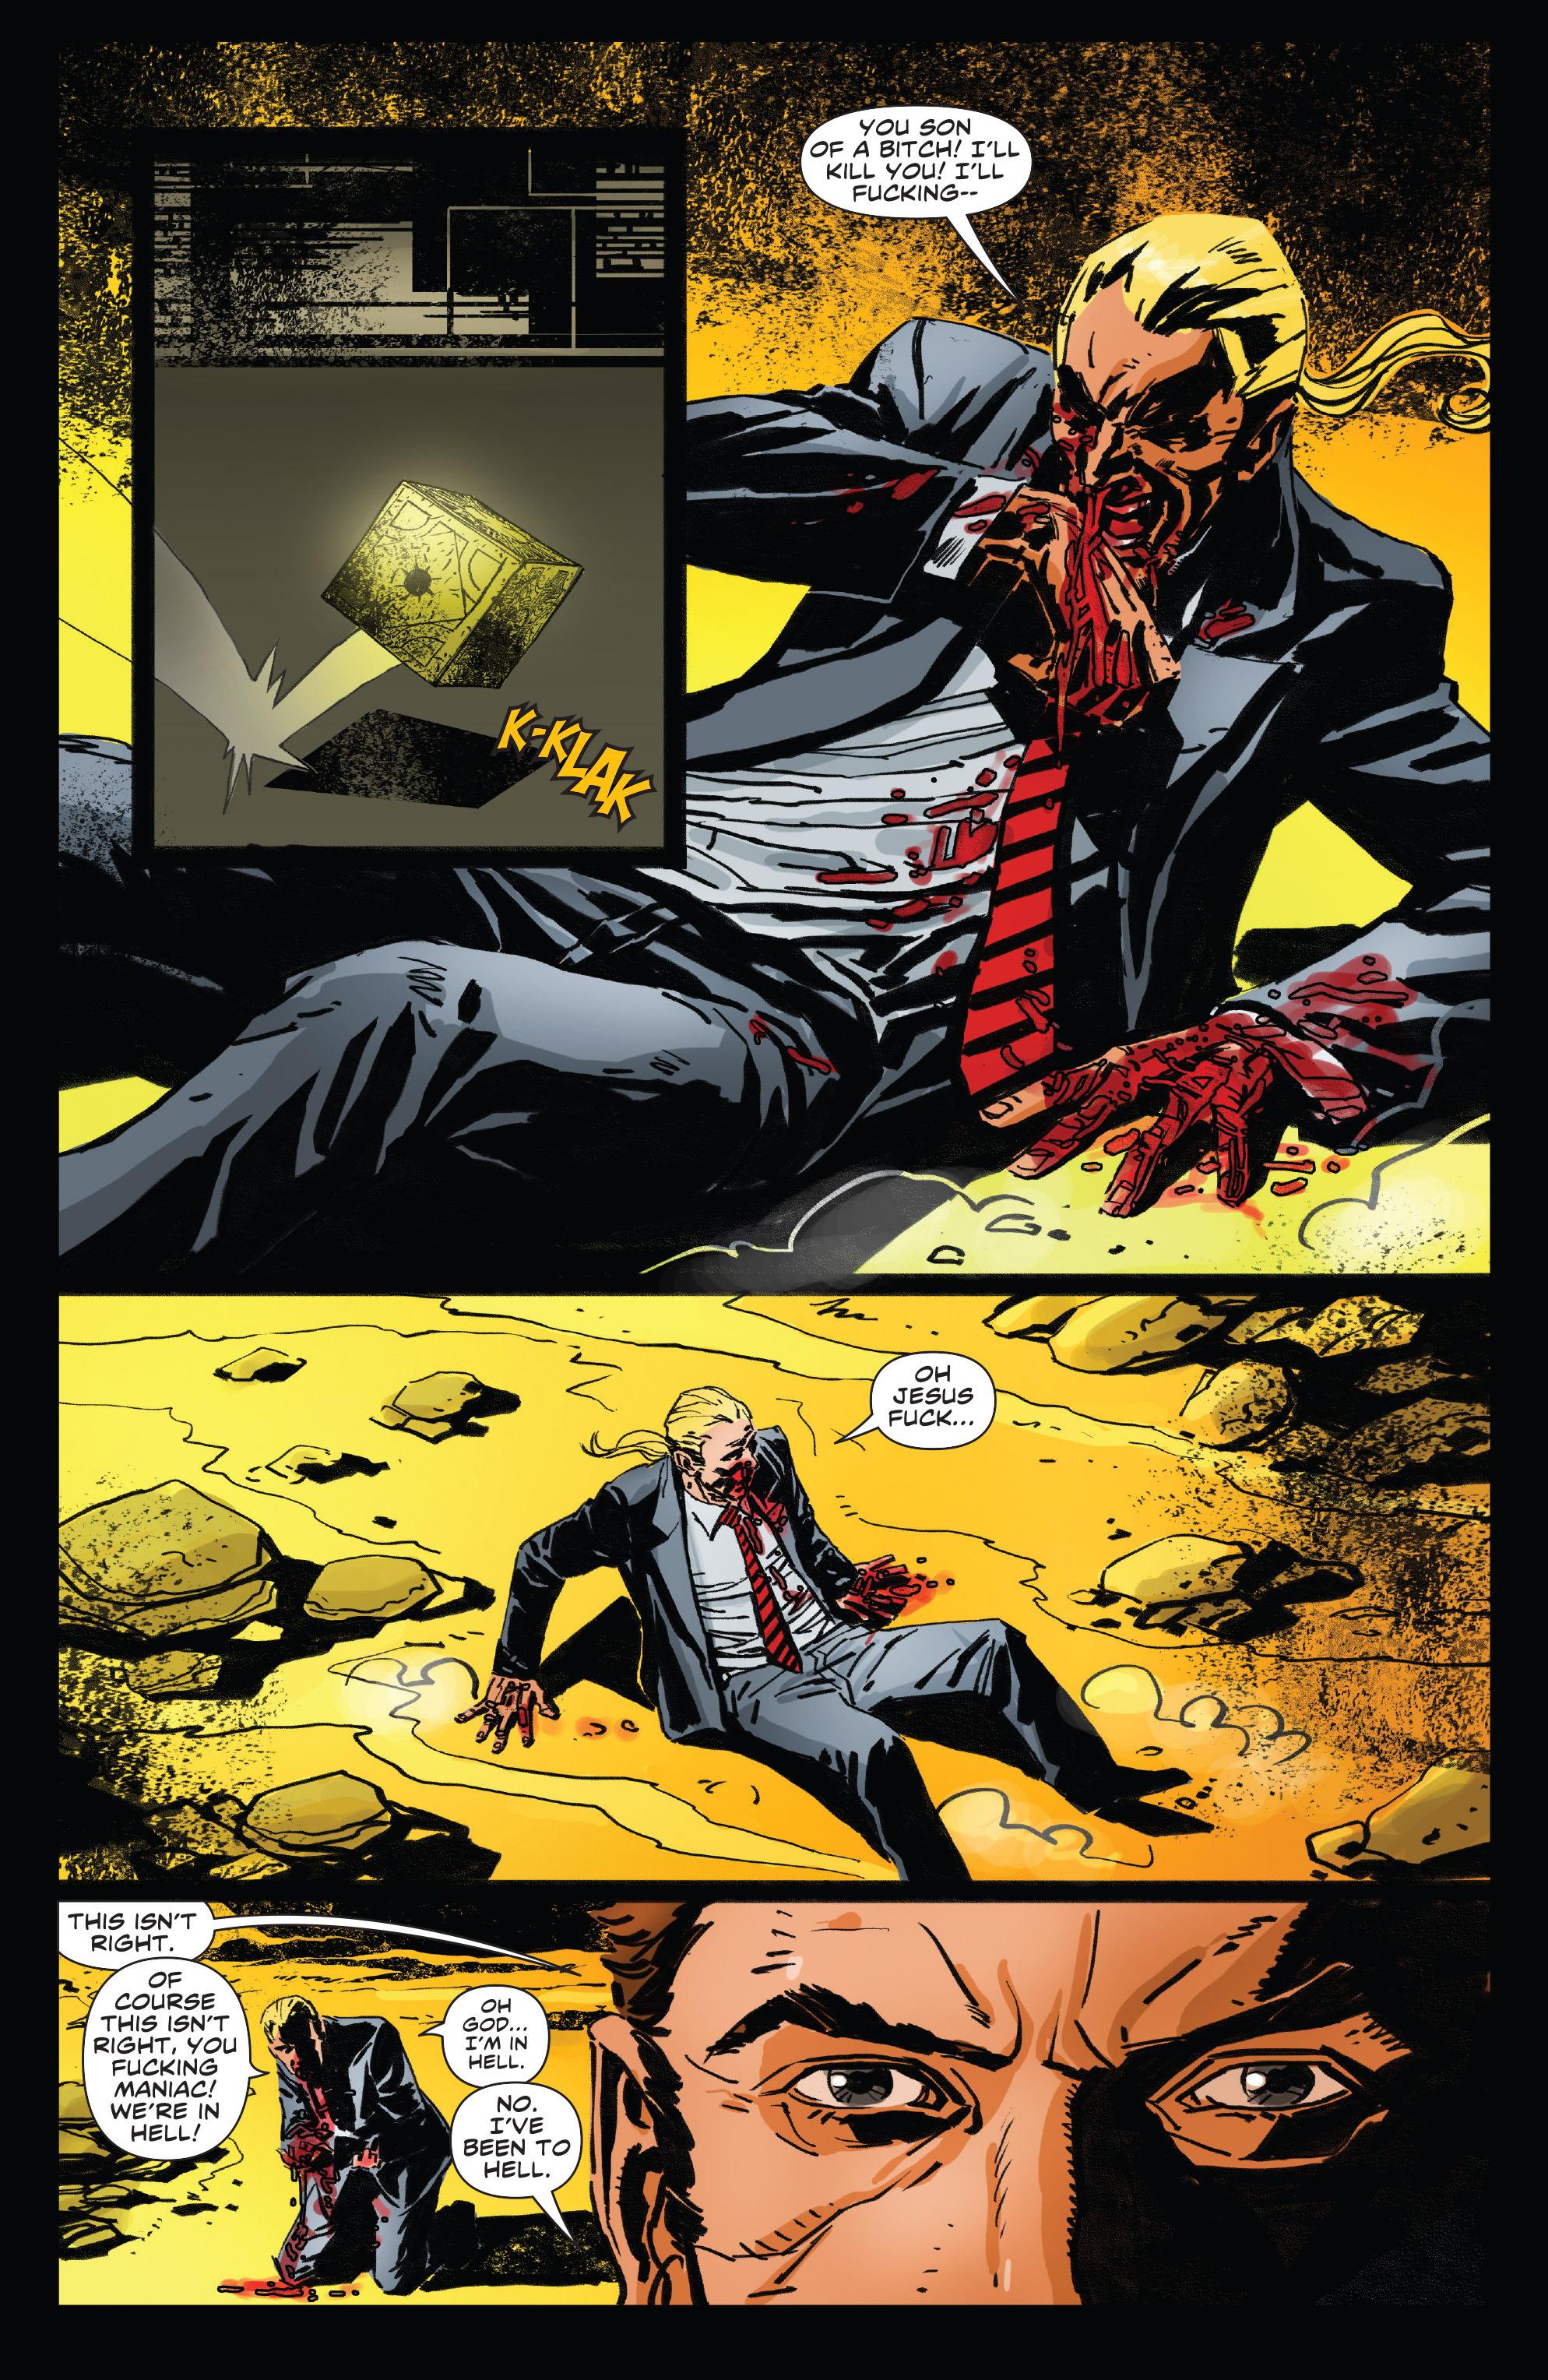 Read online Clive Barker's Hellraiser: The Dark Watch comic -  Issue # TPB 3 - 23